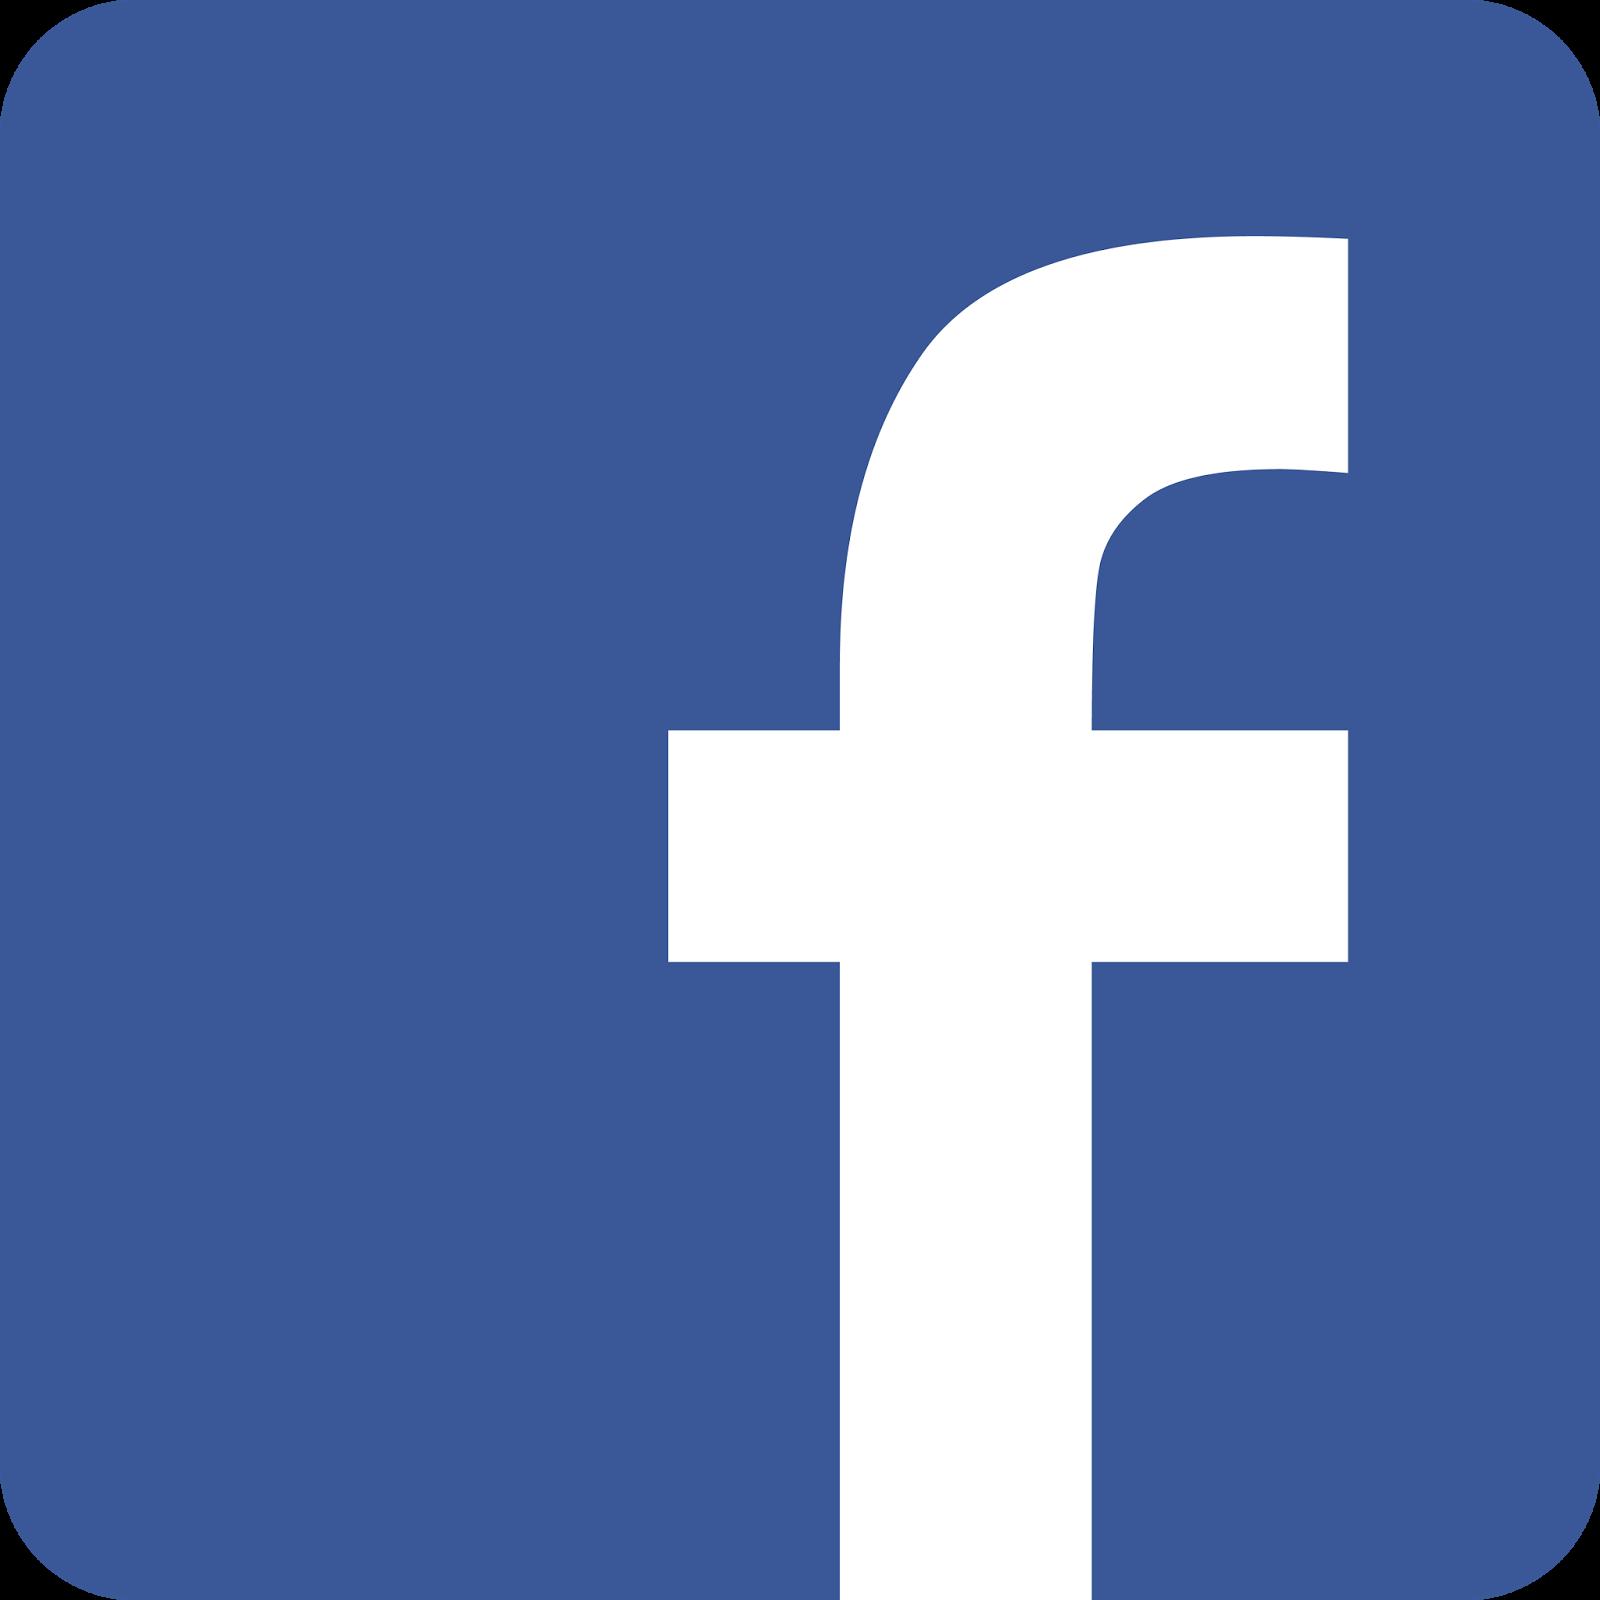 Facebook - Like 105 FM